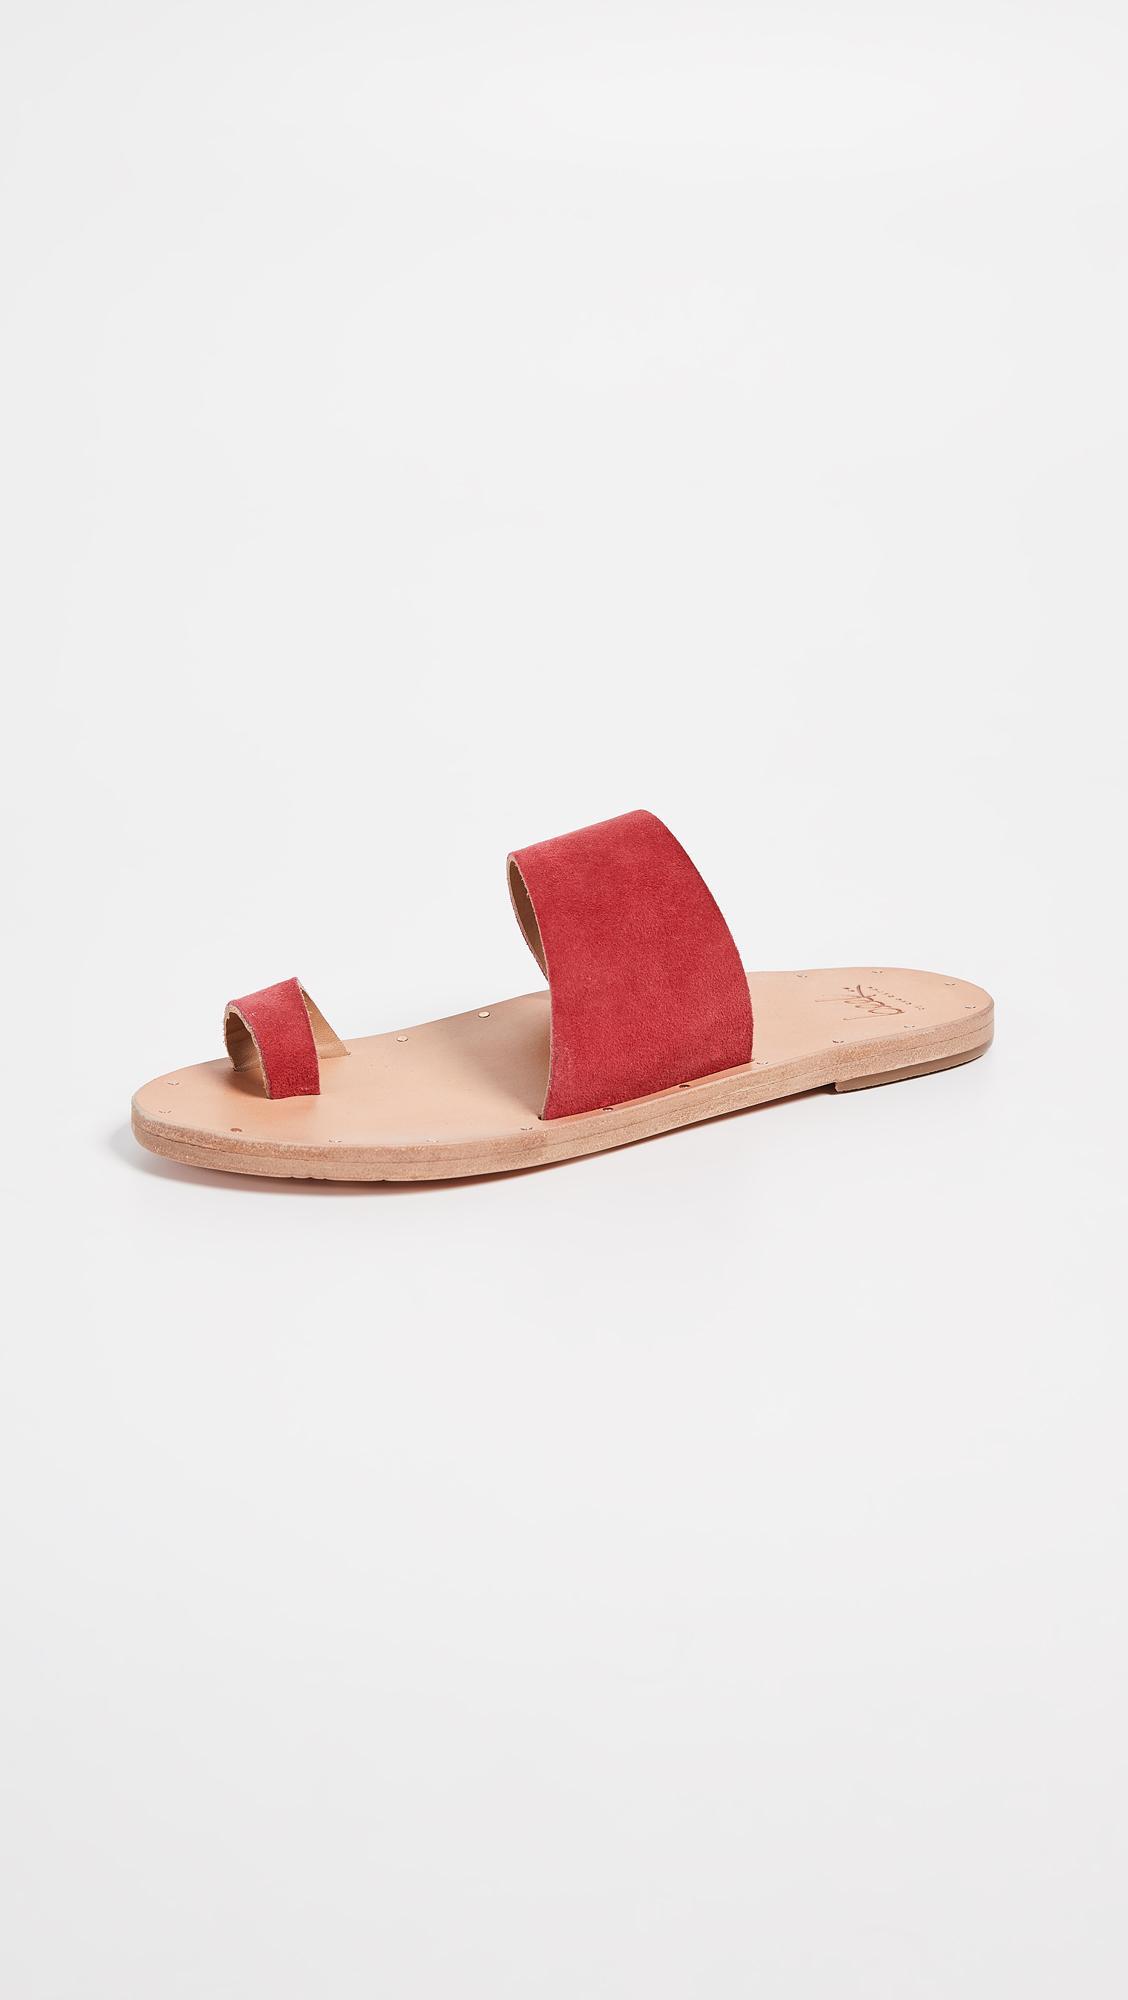 7880f0f6681fc7 Beek. Women s Finch Toe Ring Slides